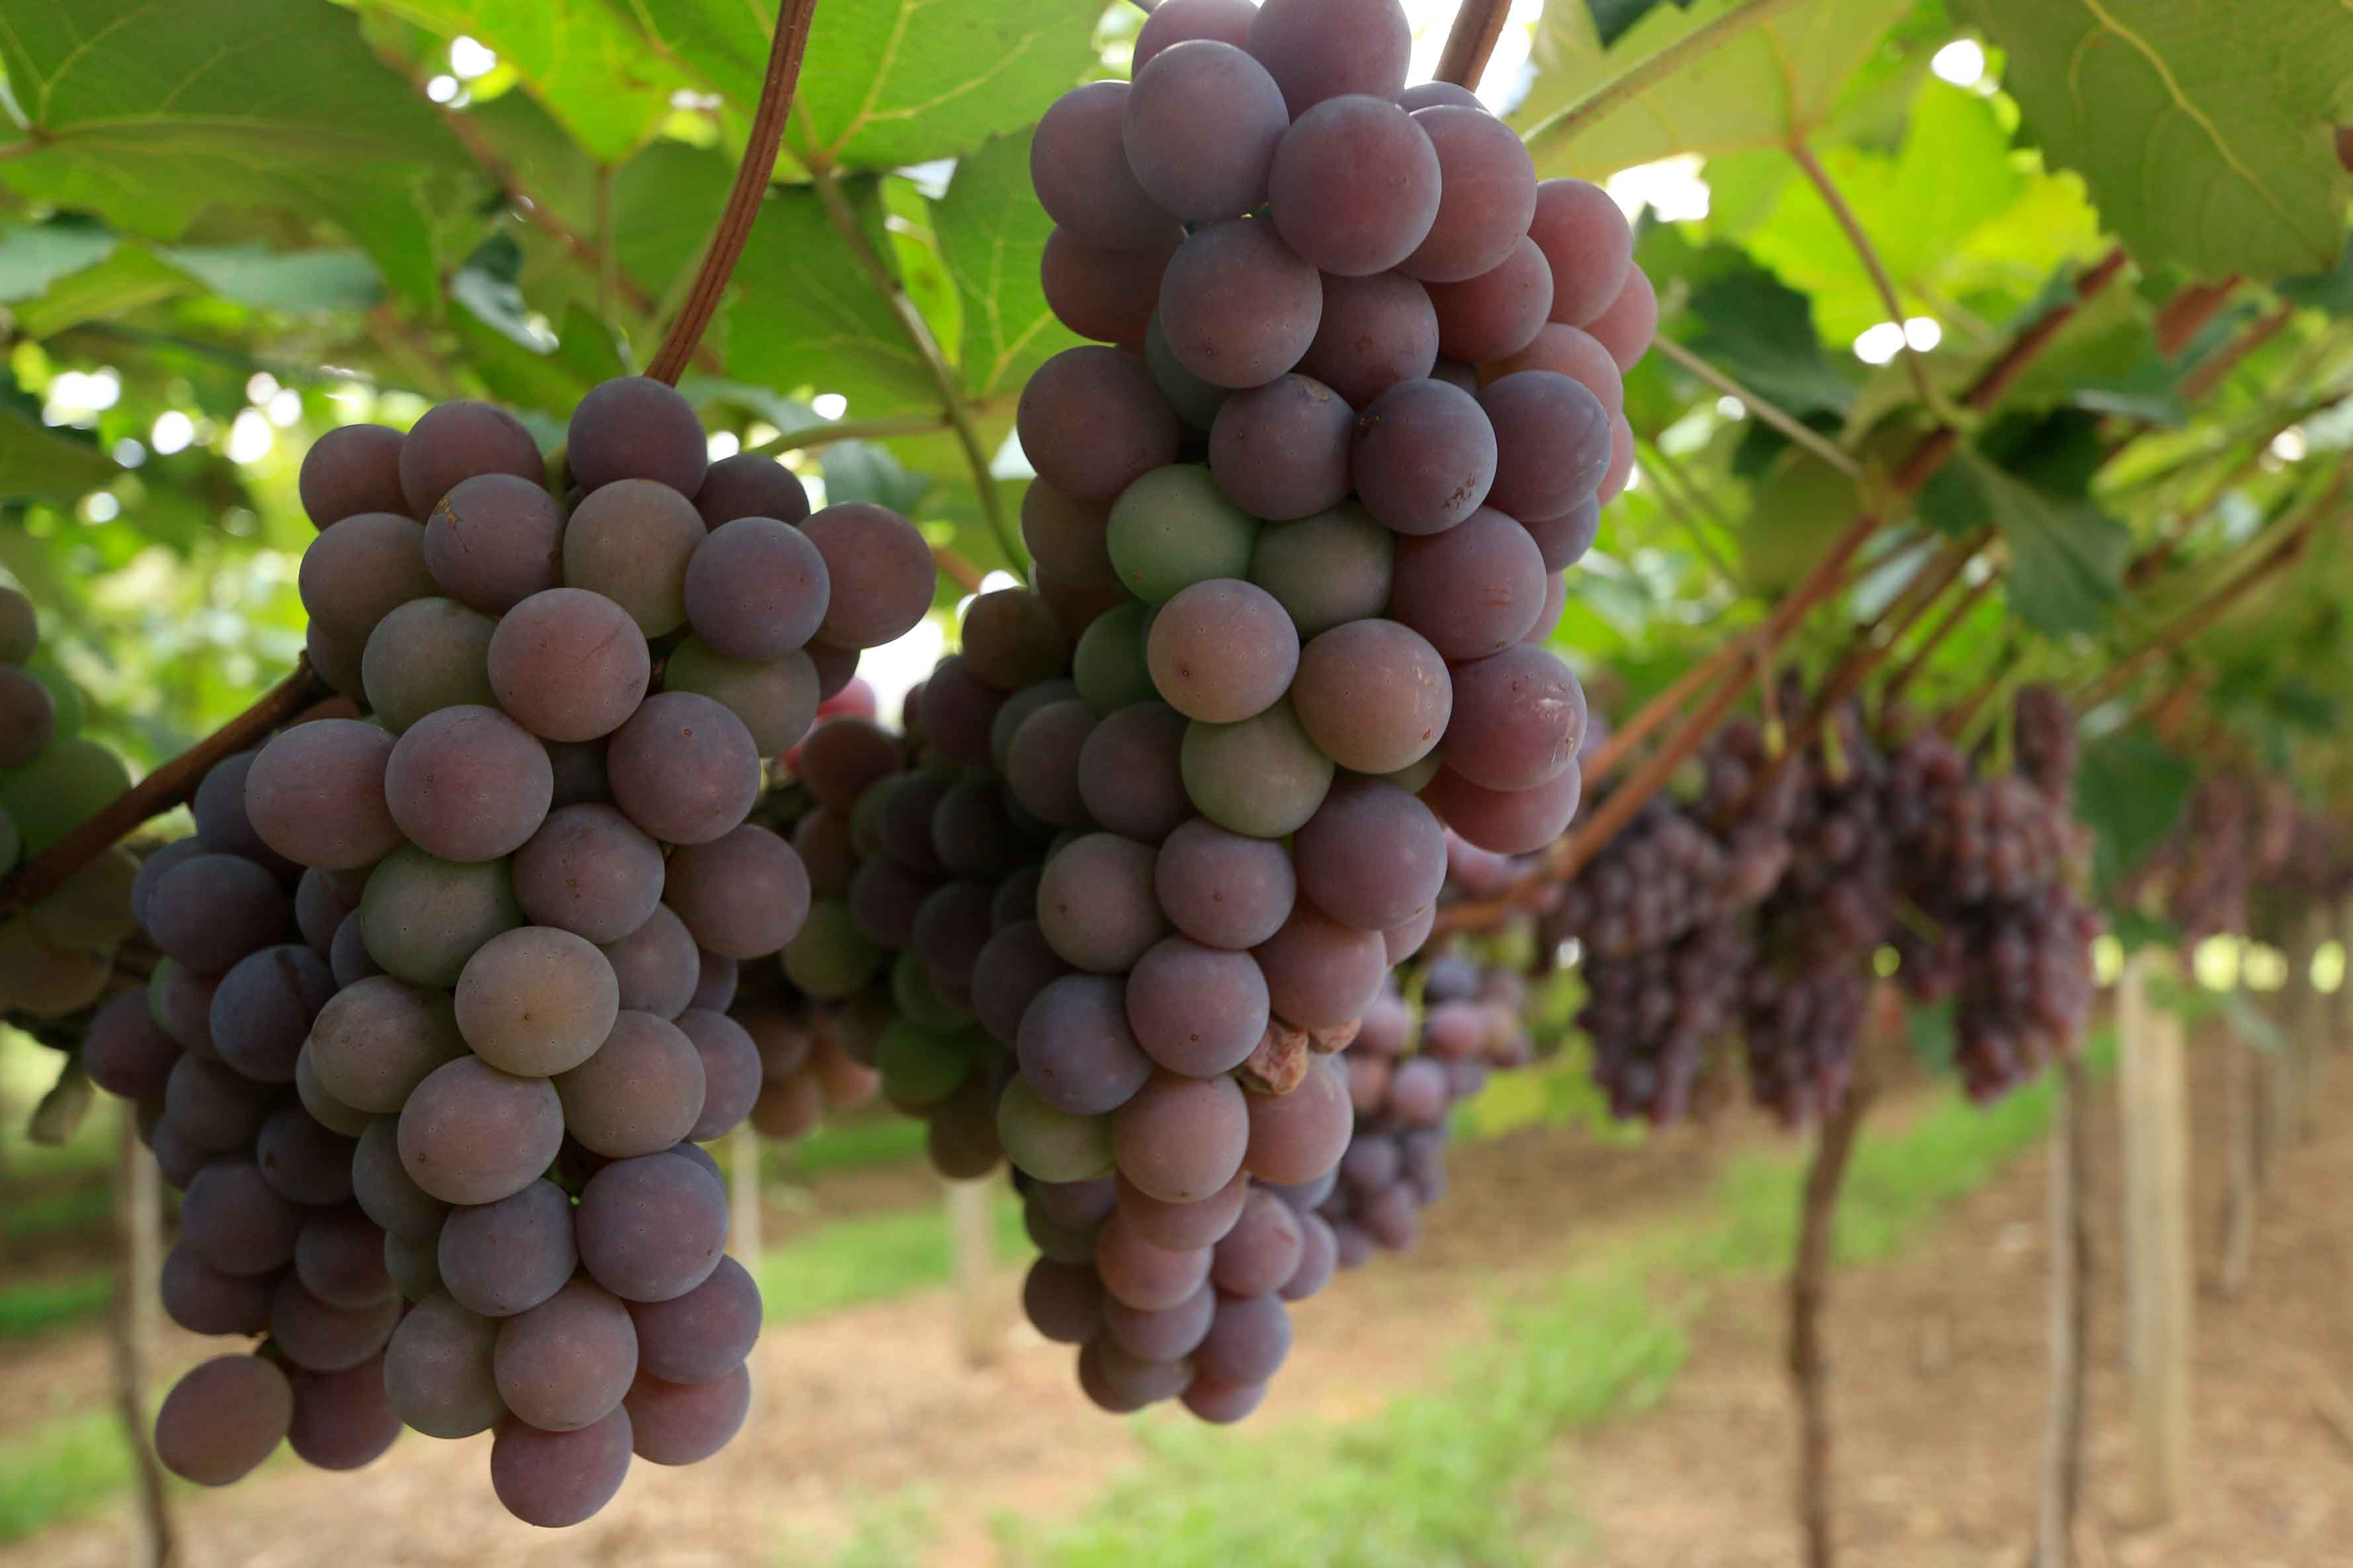 louveira-turismo-rural-plantacao-frutas-uvas-_MG_2390-bx